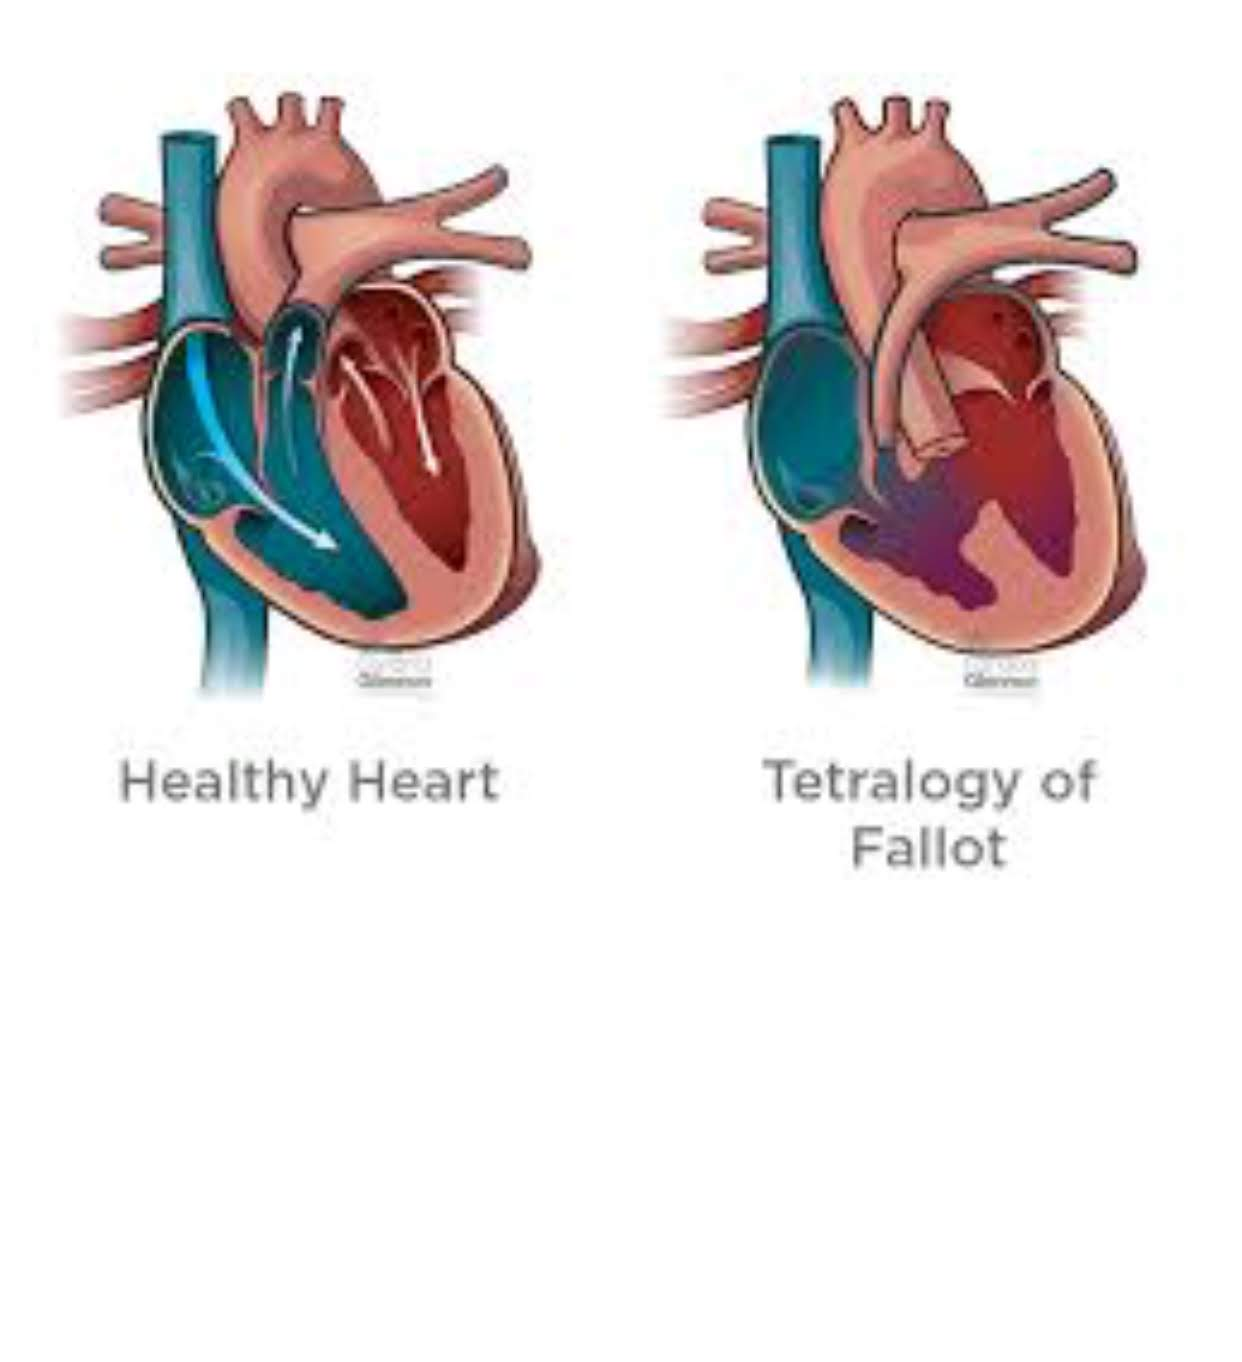 tetralogy of fallot heart image